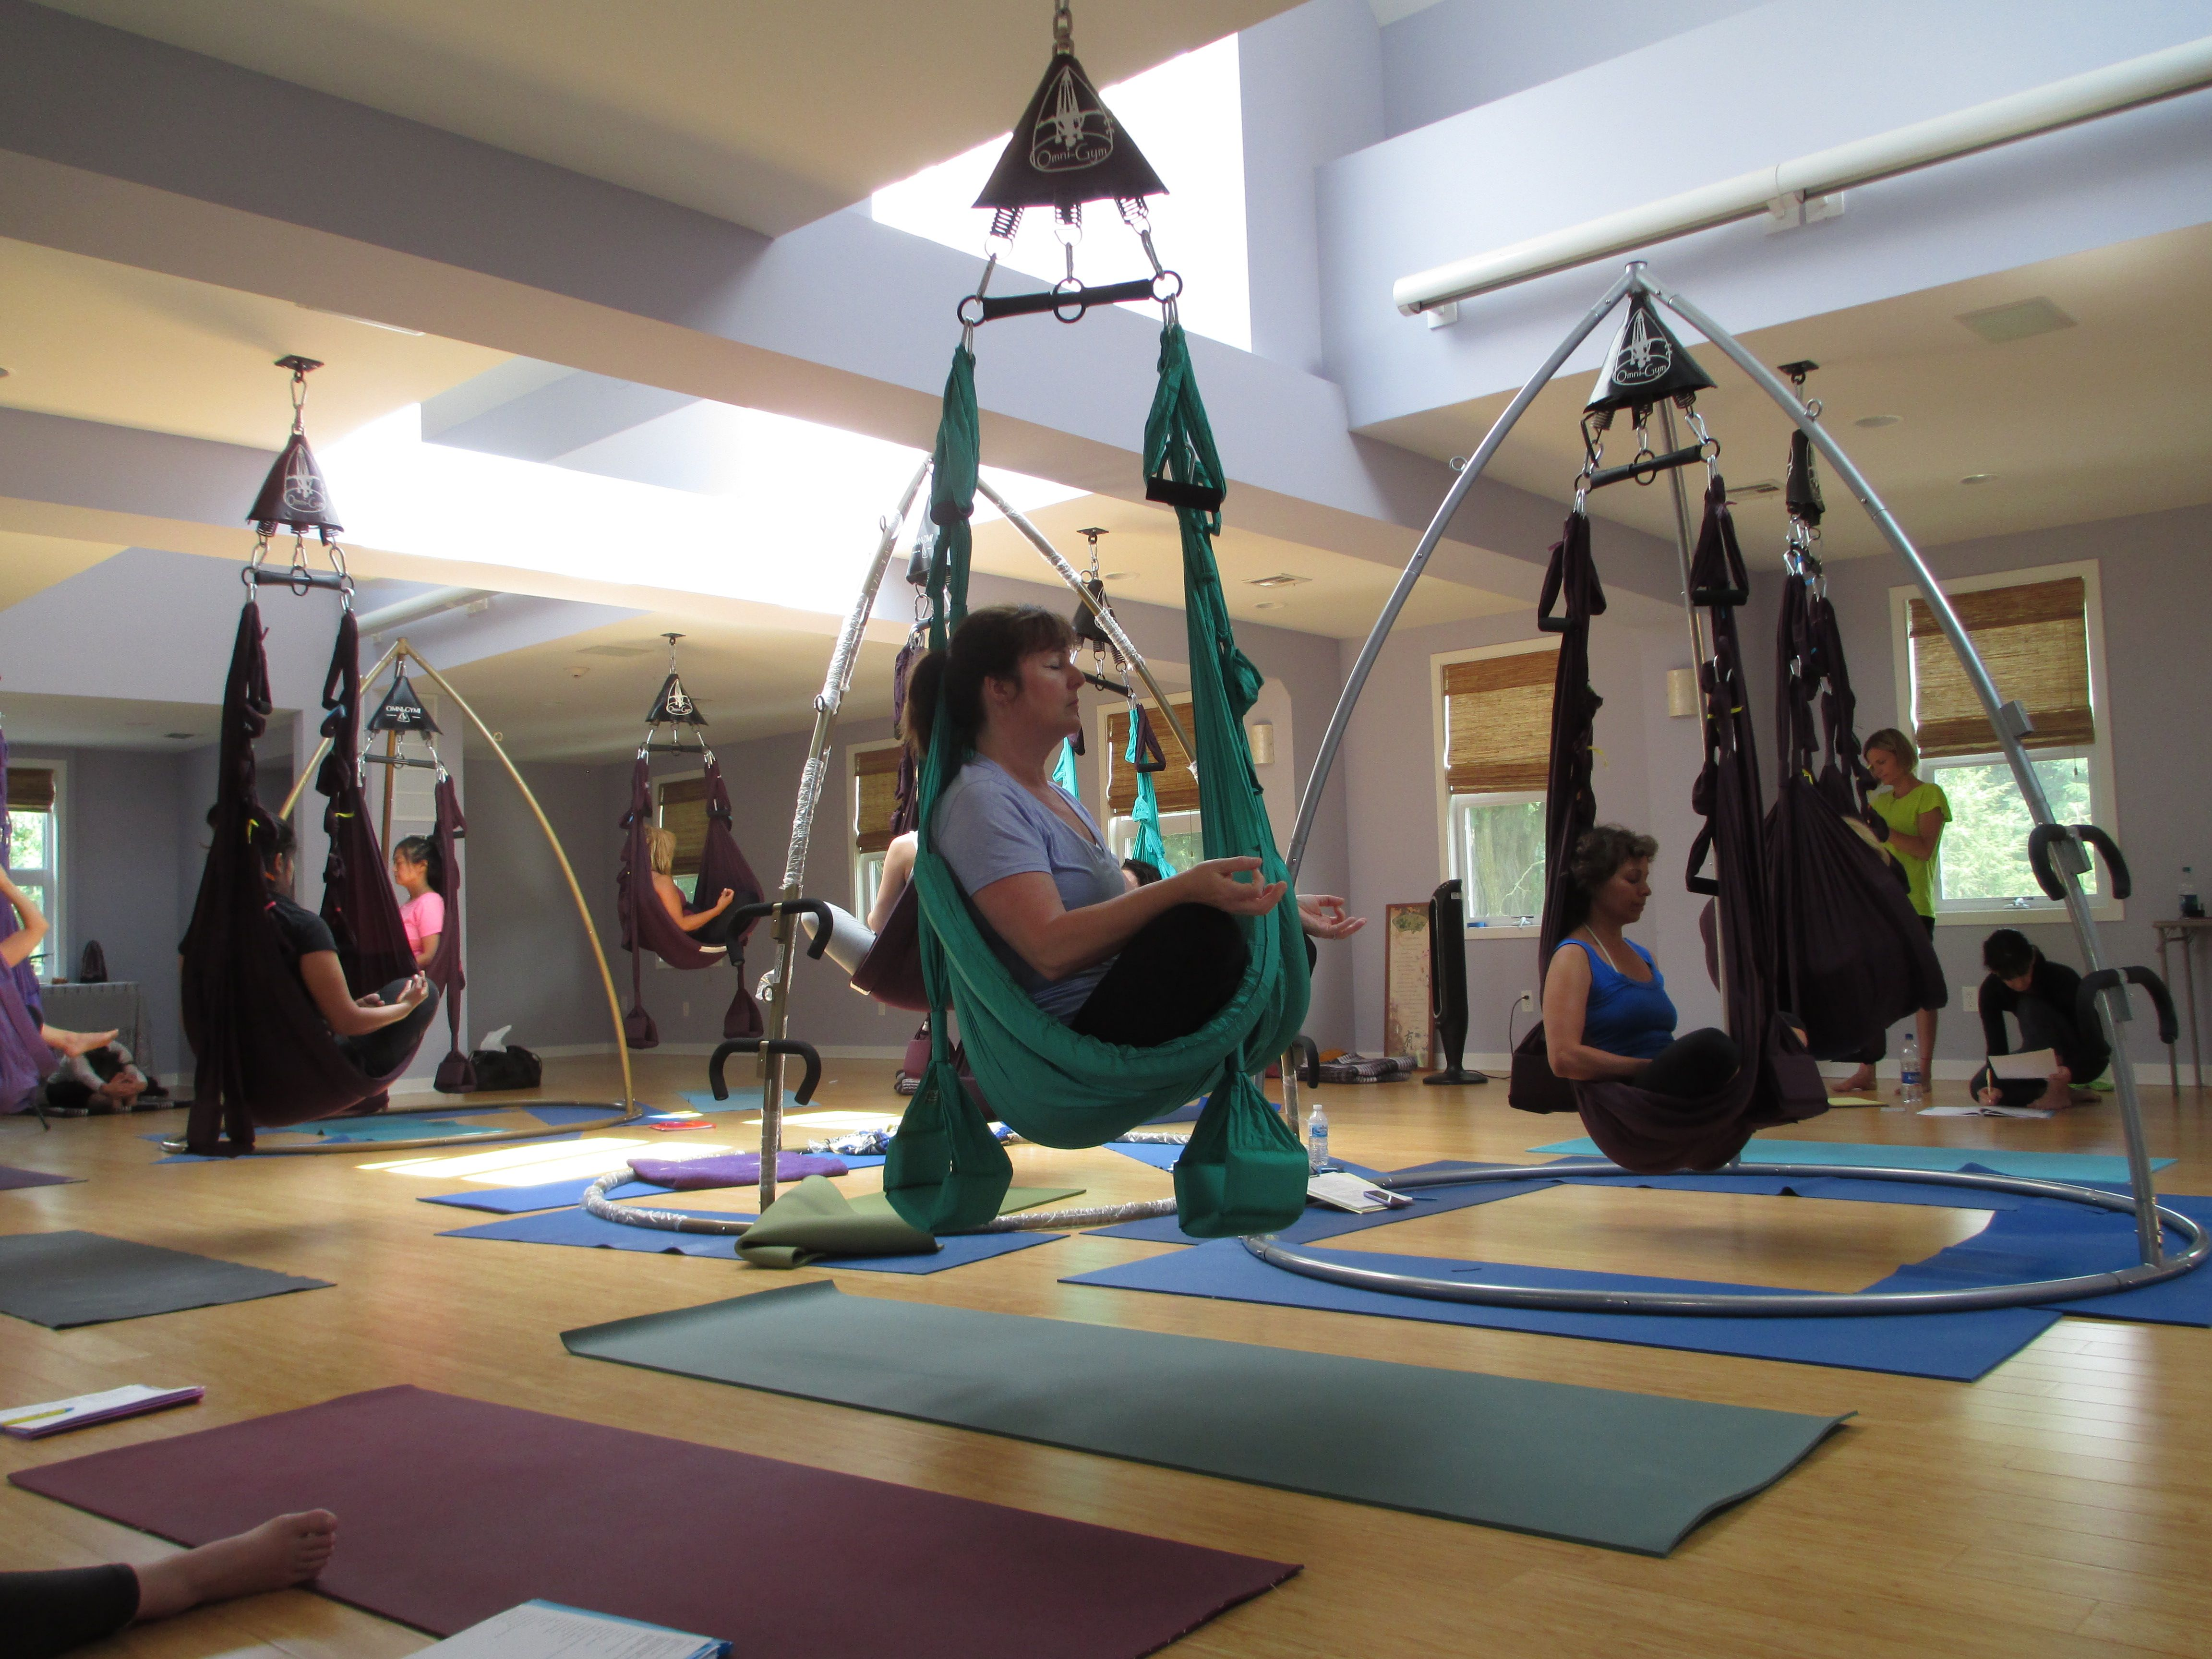 Omni Gym Yoga Swing Teacher Training At The Princeton Center For Yoga And Health Yoga Swing Aerial Yoga Teacher Training